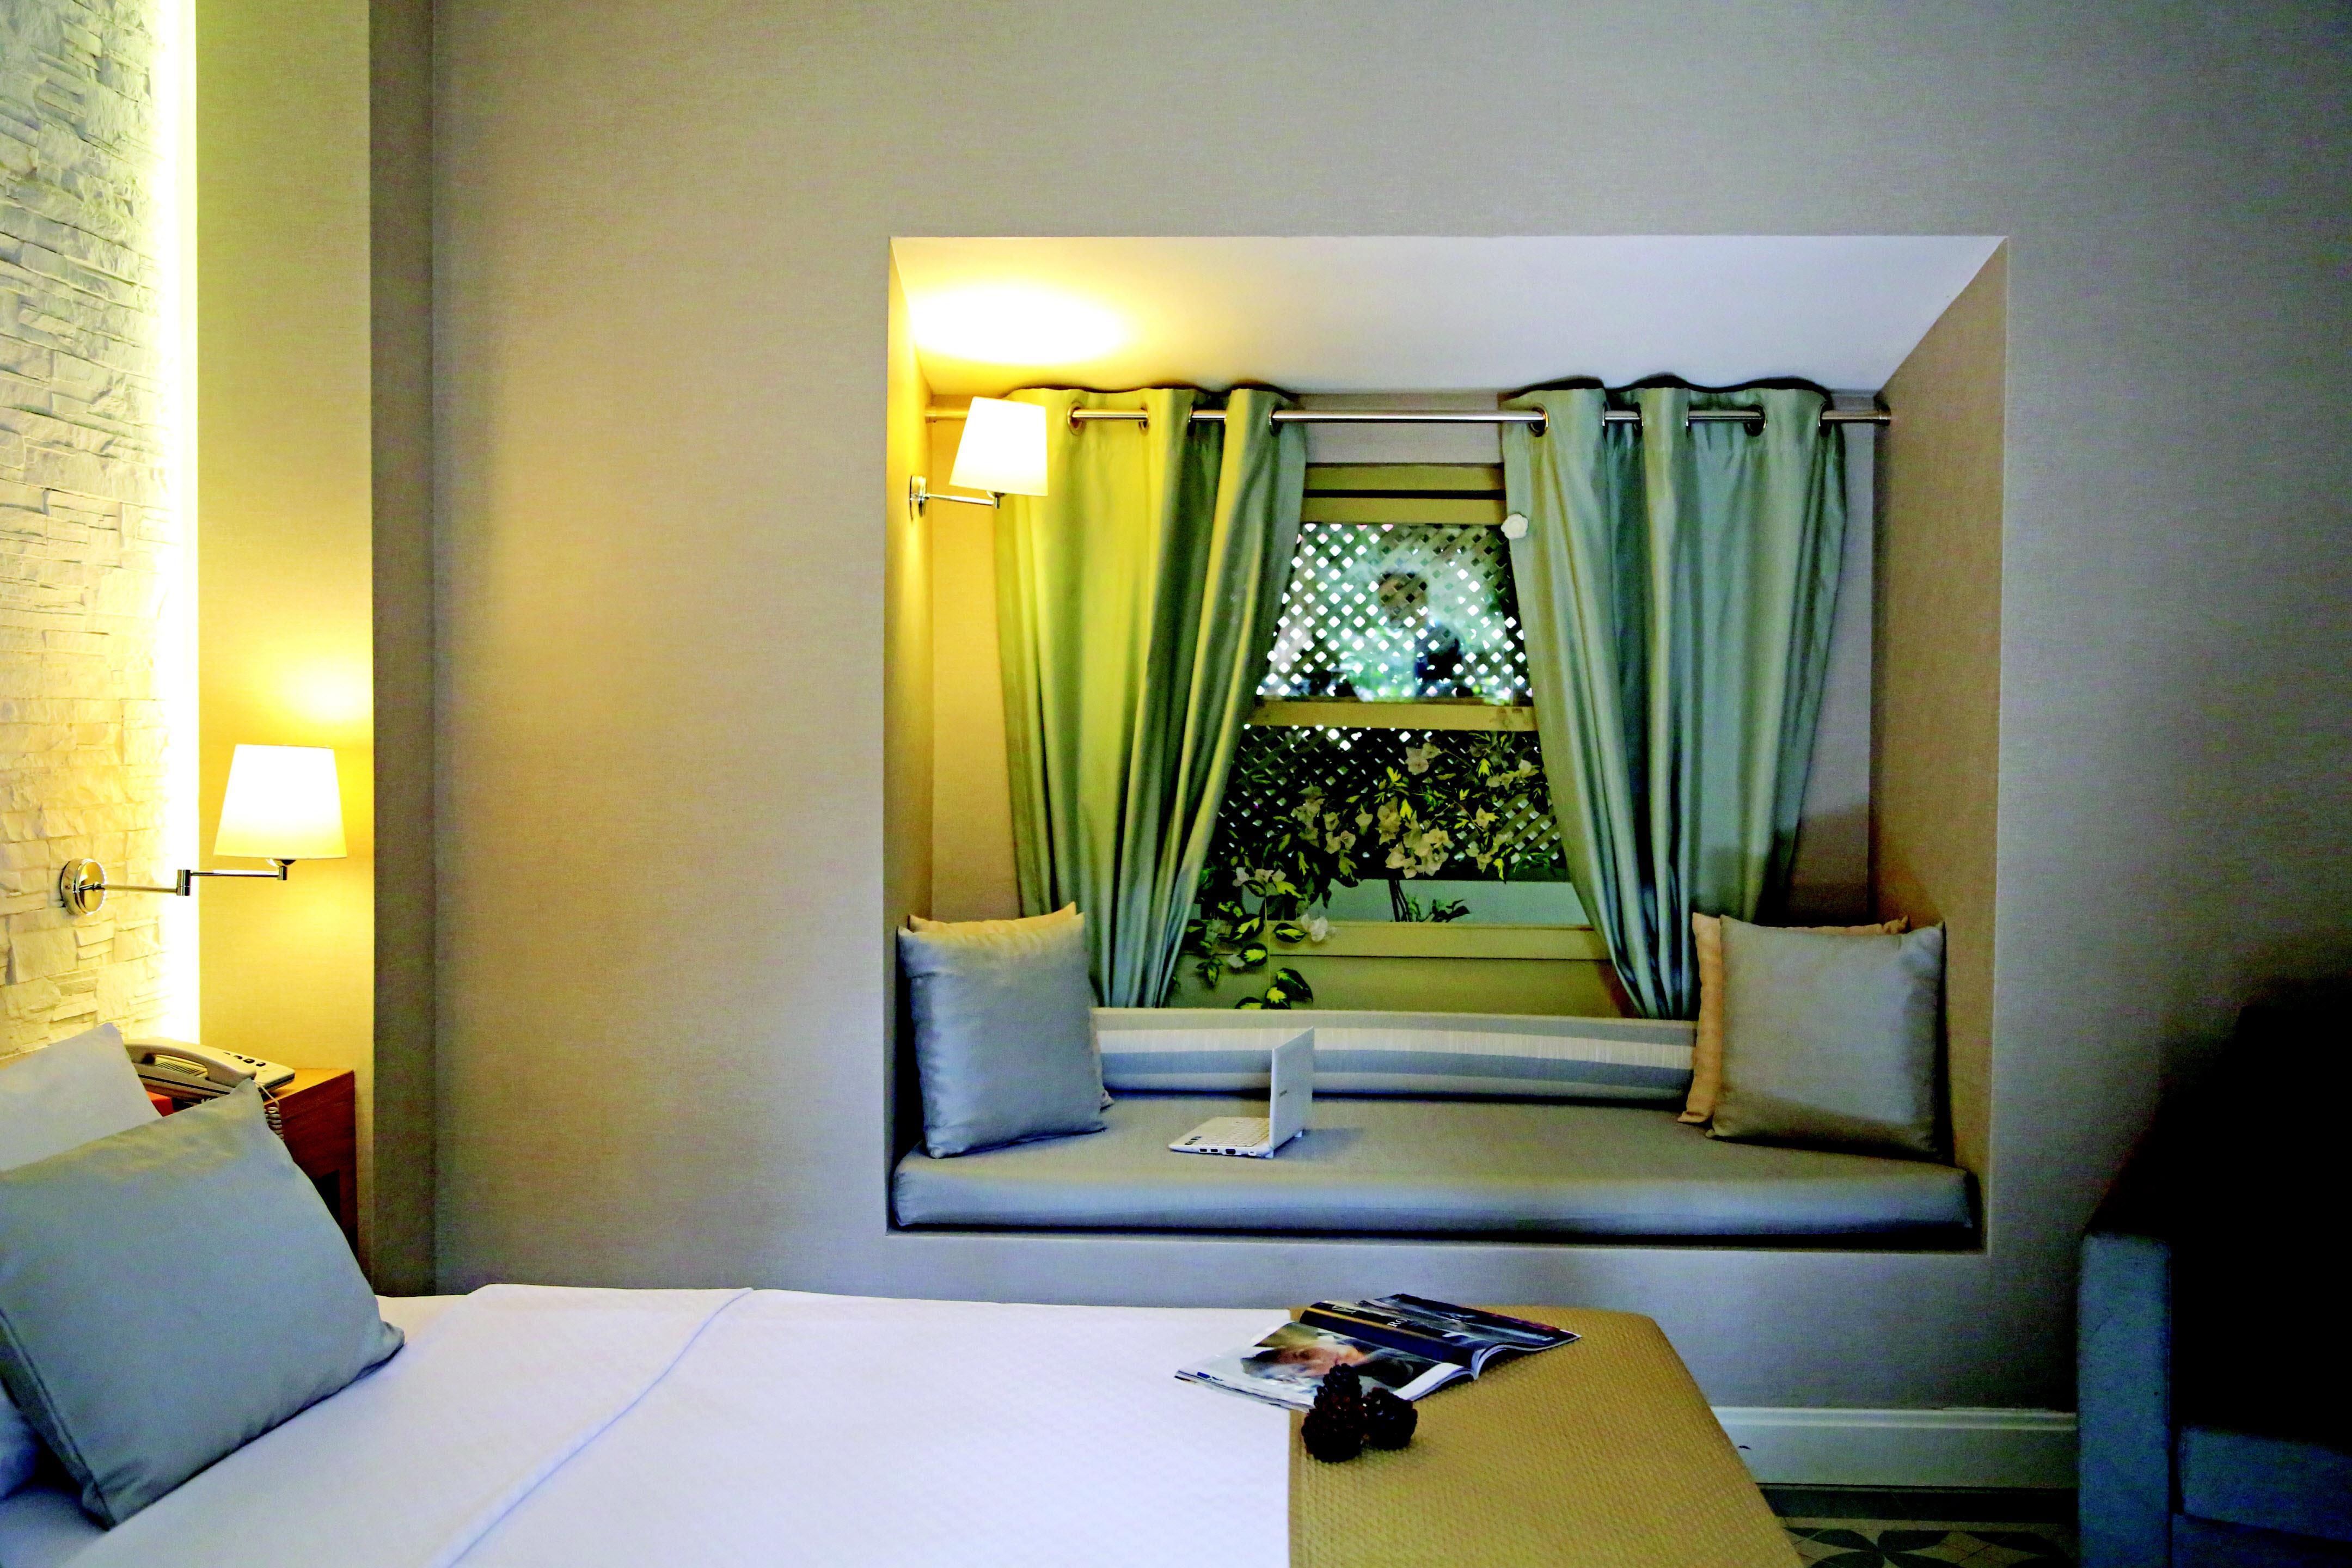 http://www.orextravel.sk/OREX/hotelphotos/ulusoy-kemer-holiday-club-area-0016.jpg